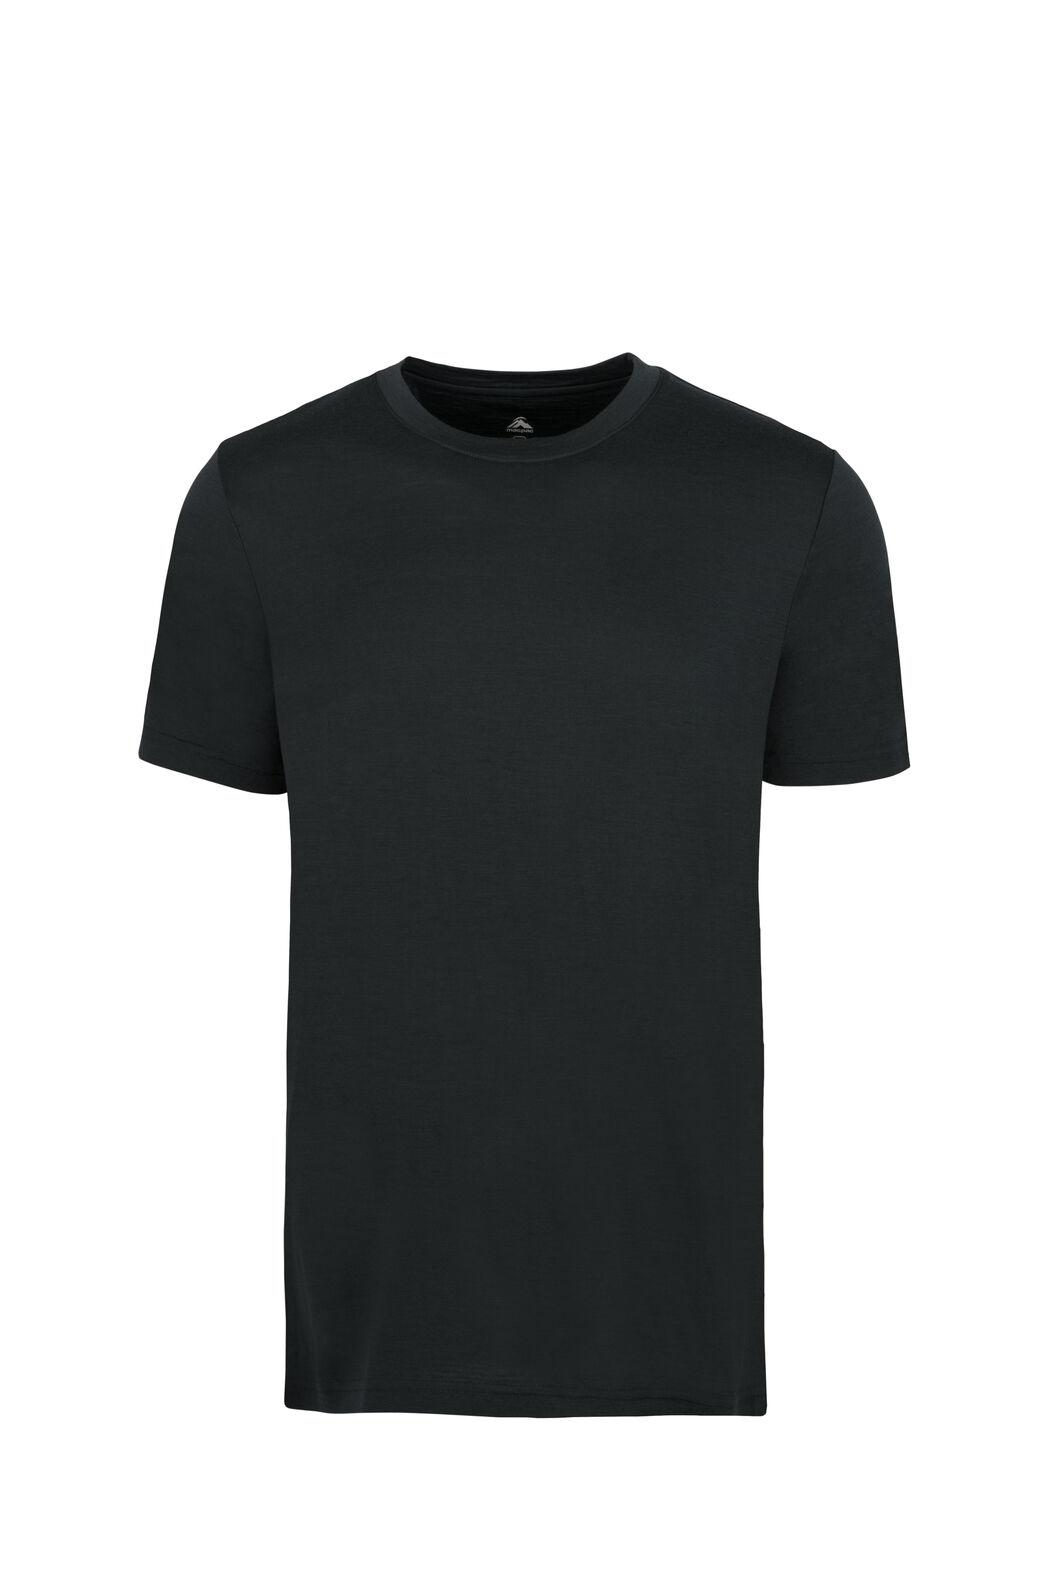 Macpac Lyell 180 Merino Tee — Men's, Black, hi-res